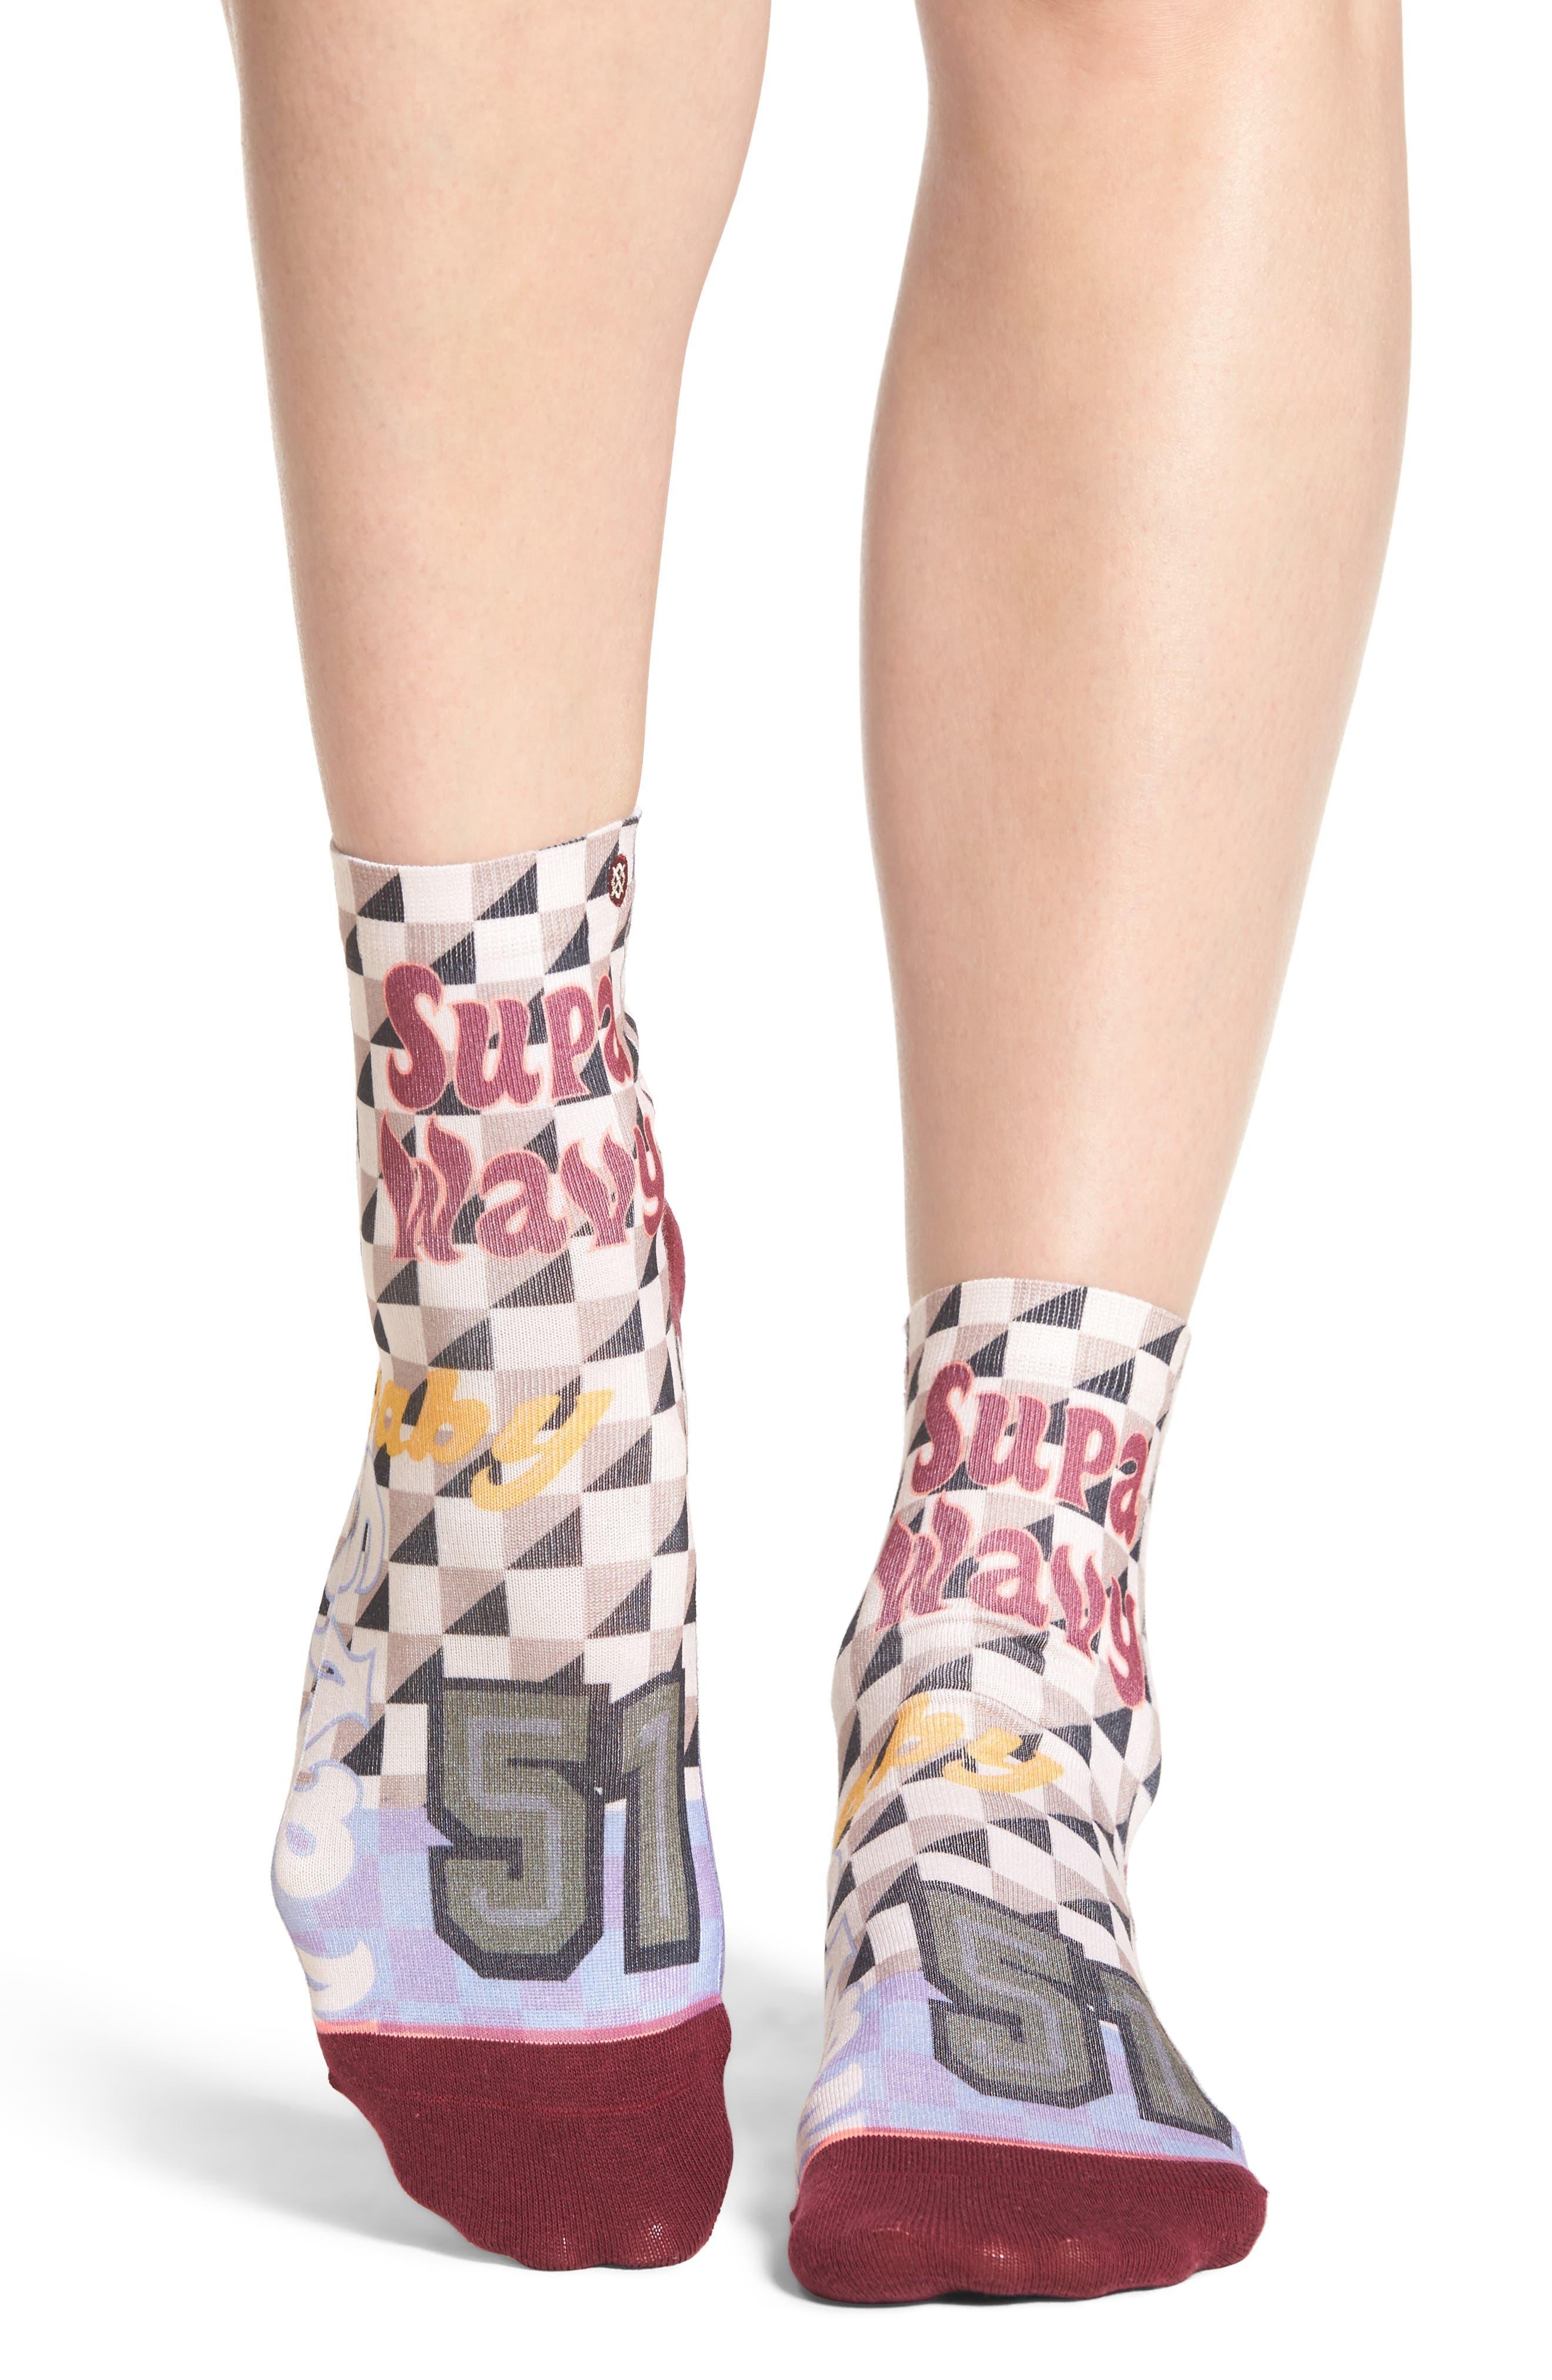 Lowrider Supa Wavy Socks,                         Main,                         color, White Multi